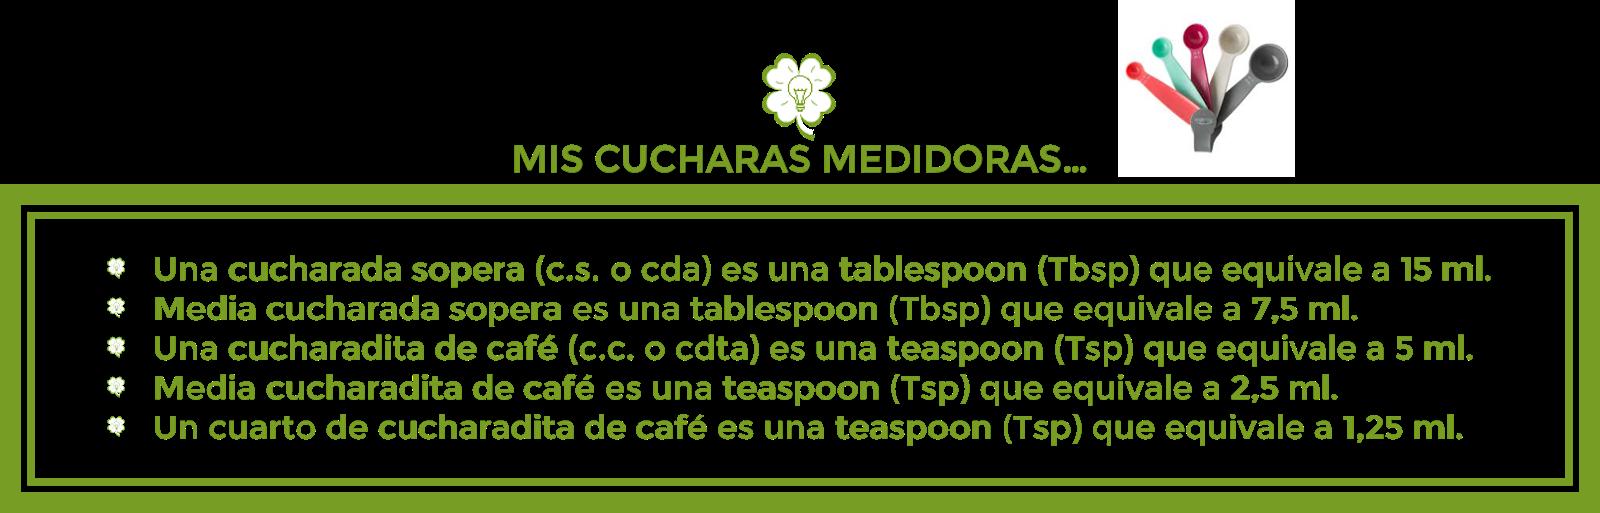 CUCHARAS MEDIDORAS